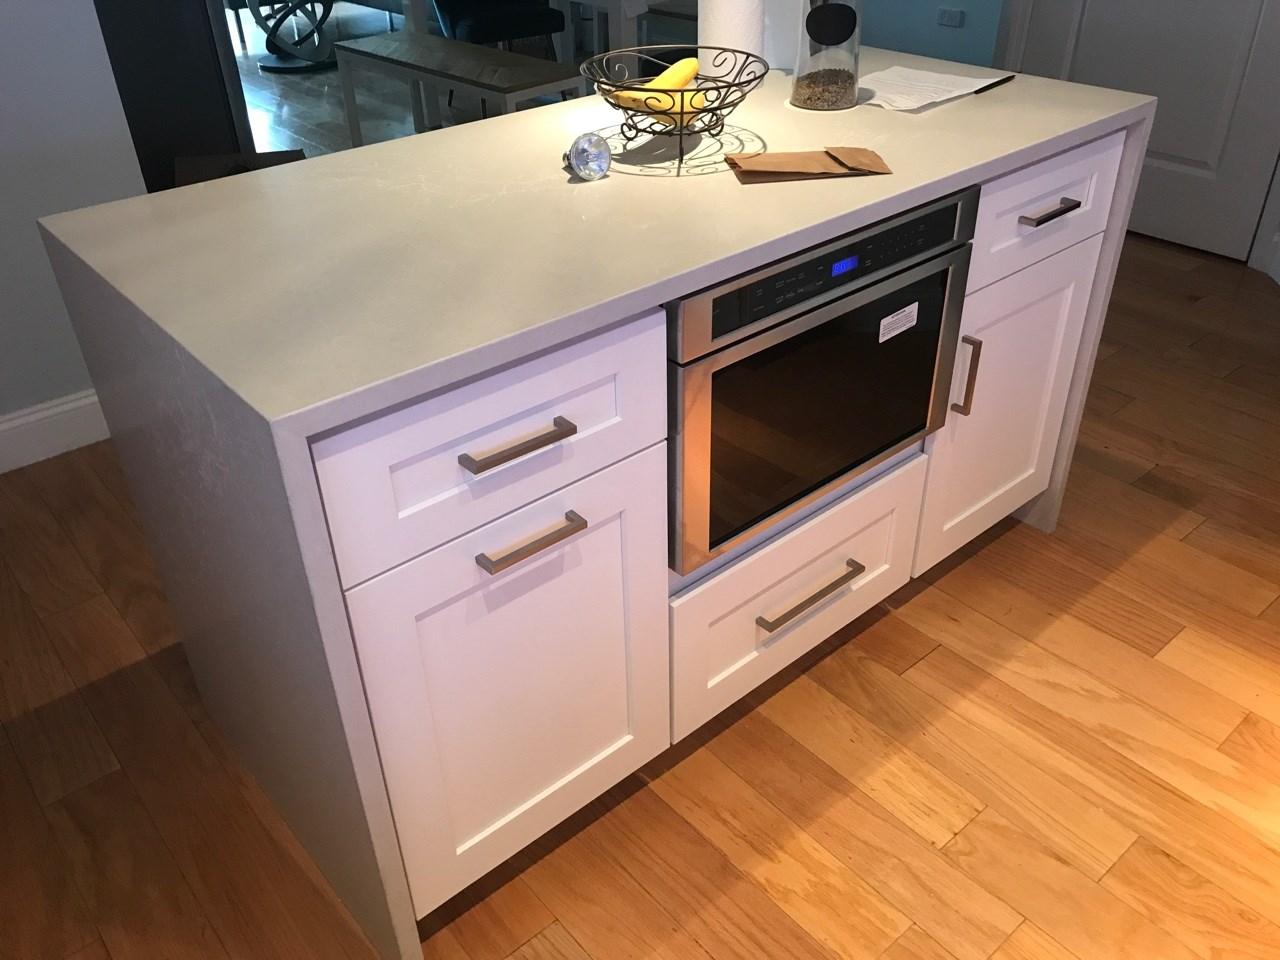 Copy of Kitchen (3)